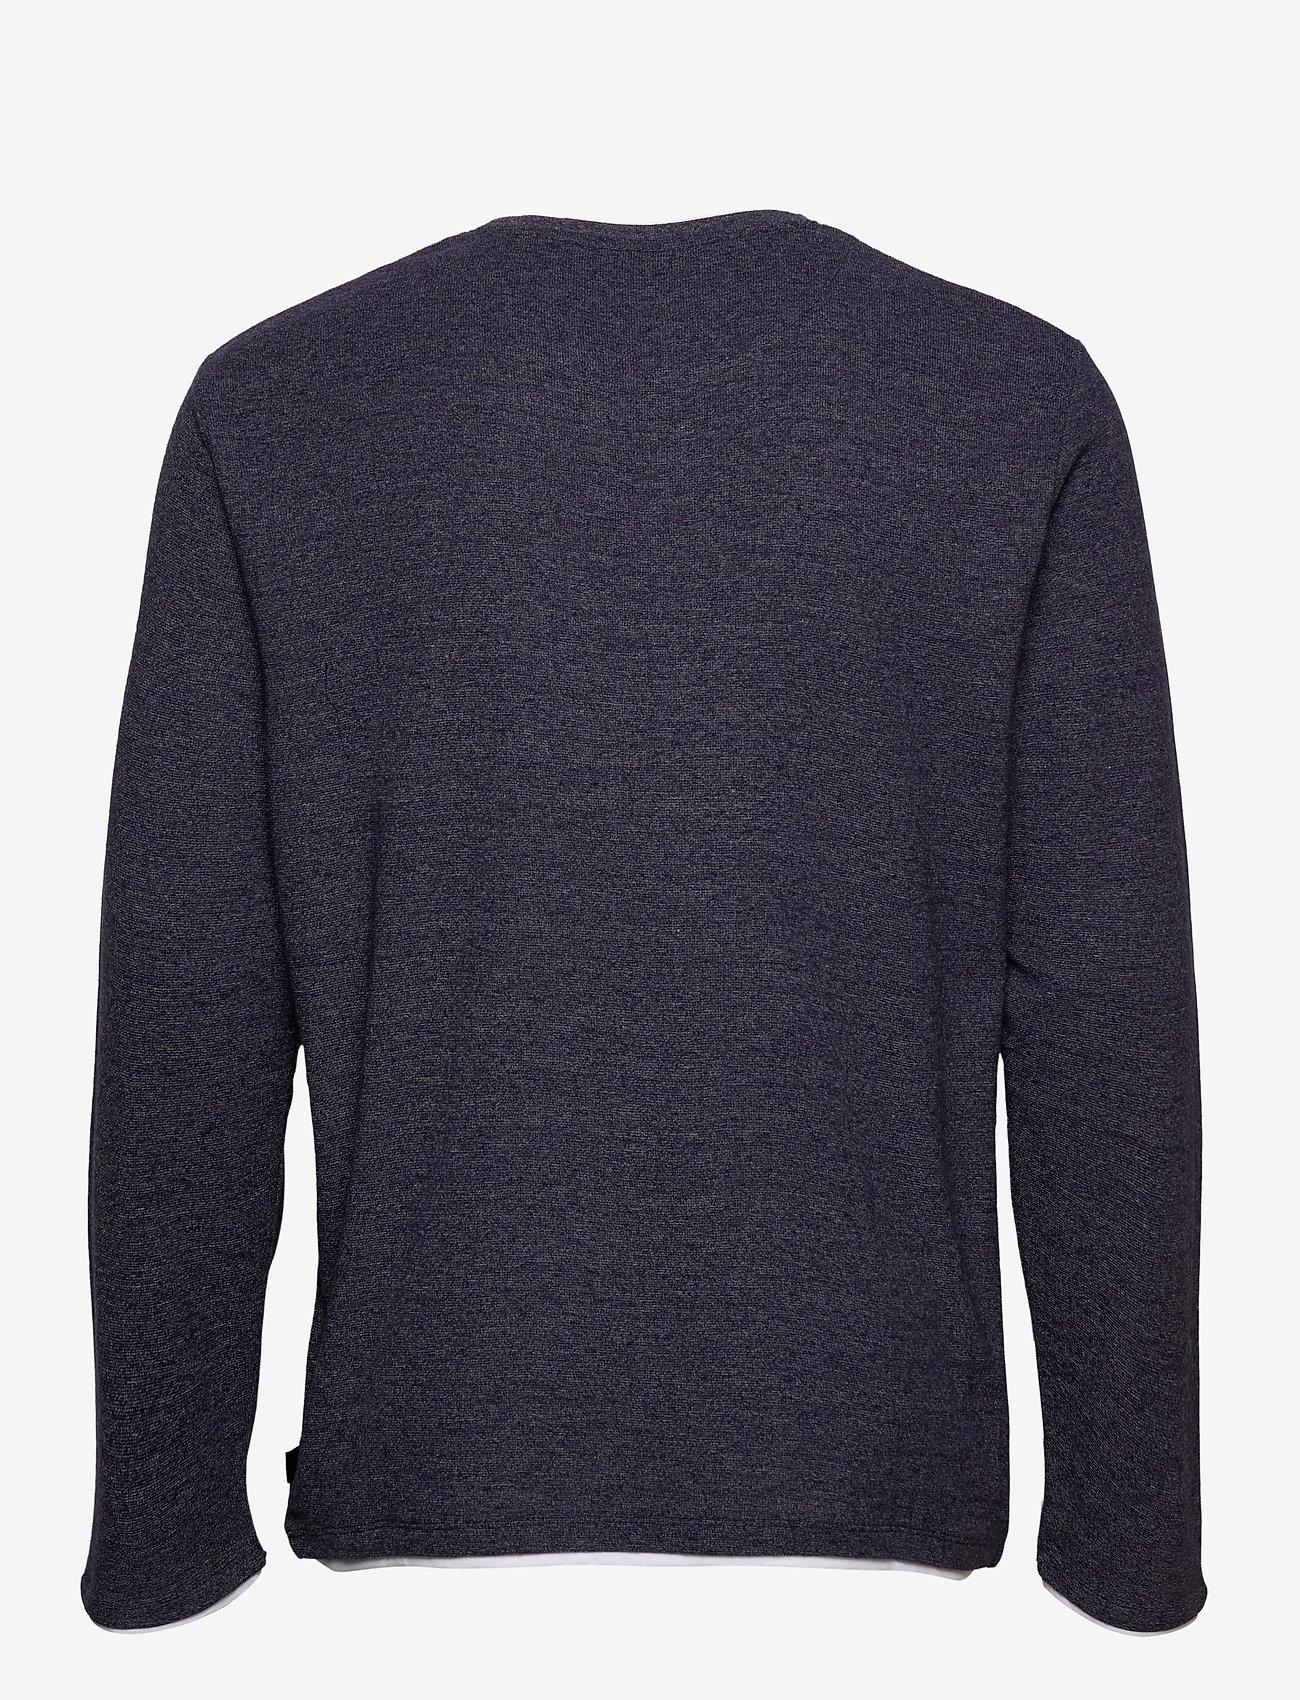 T-shirts (Navy 5) (20.99 €) - Esprit Casual a1i2w